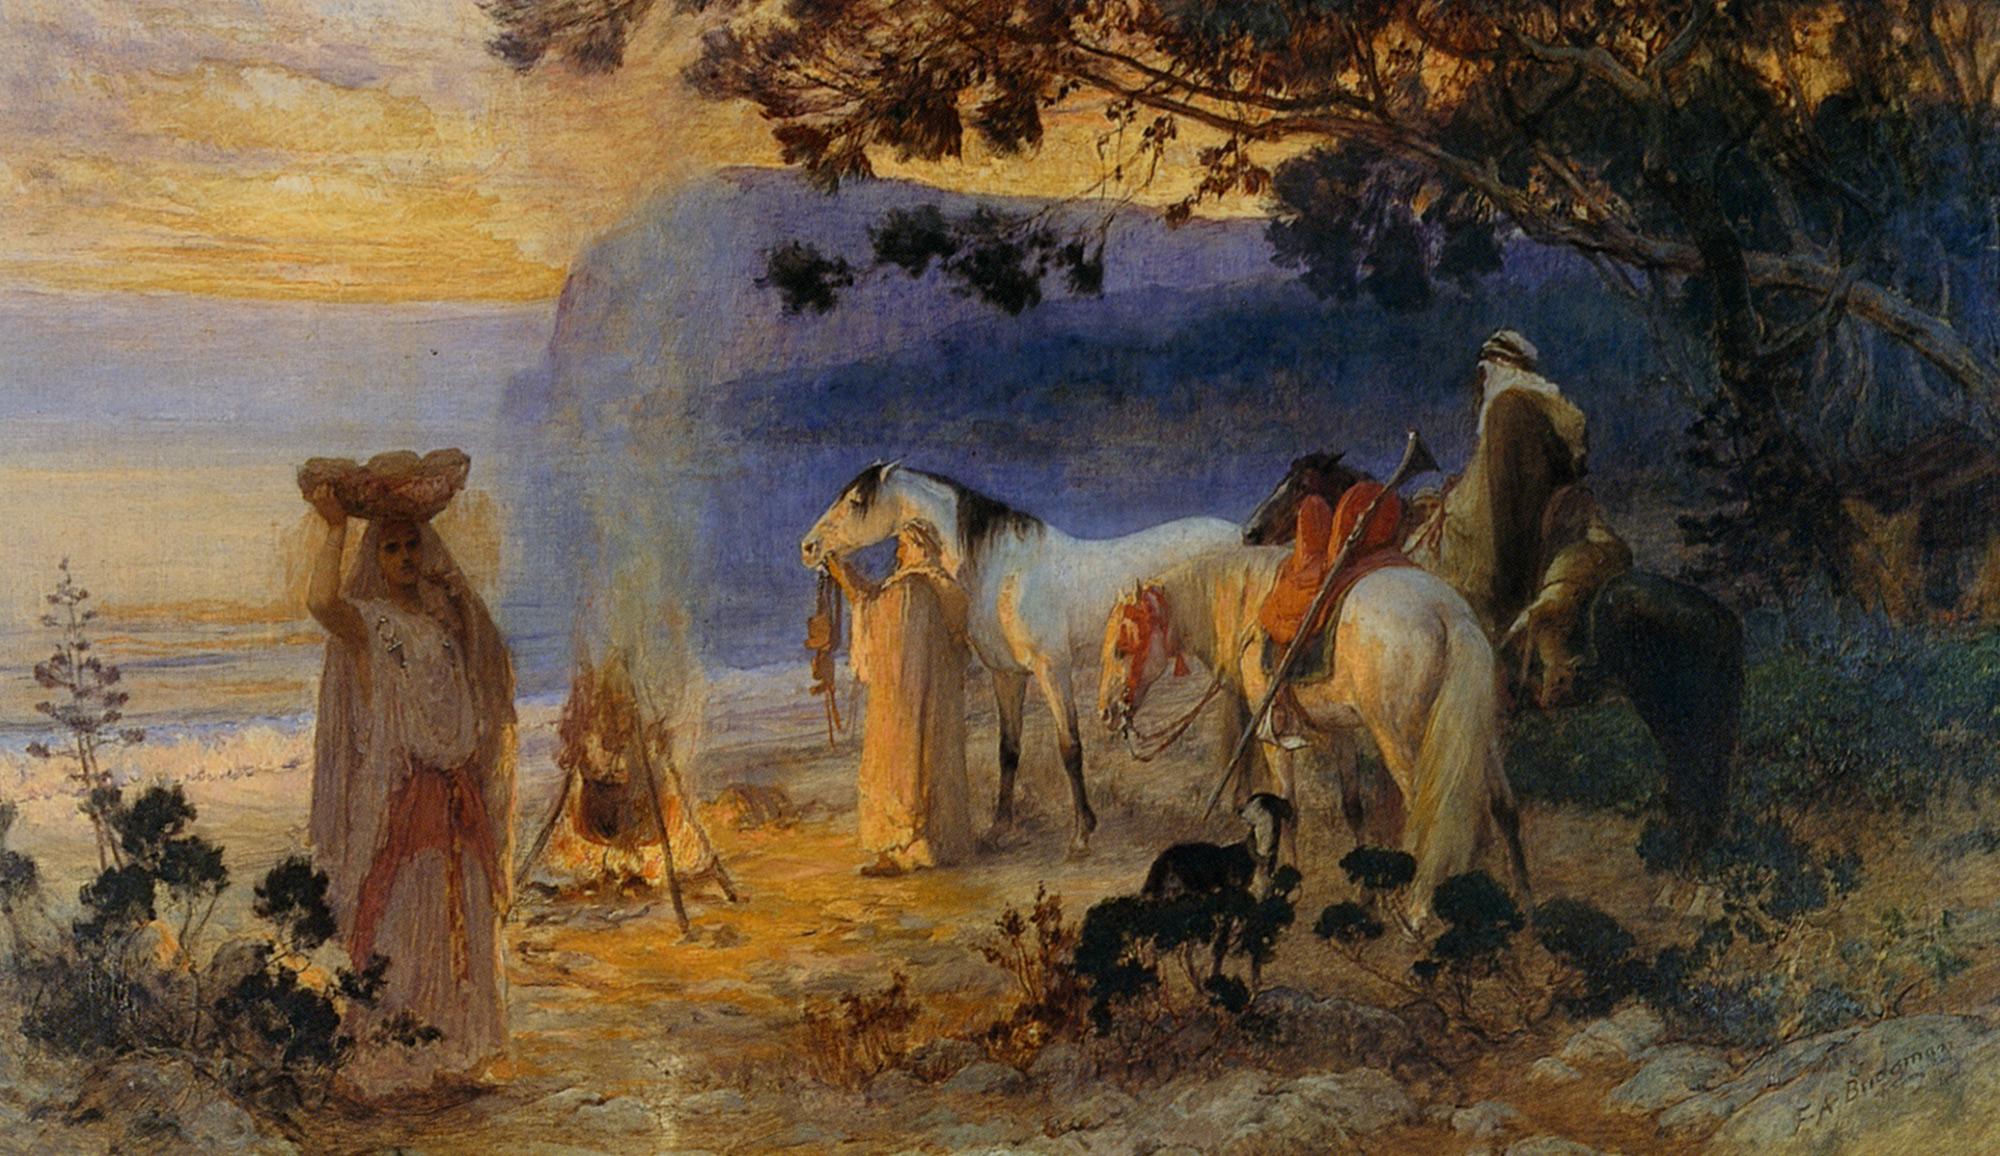 On The Coastline :: Frederick Arthur Bridgman - scenes of Oriental life (Orientalism) in art and painting ôîòî